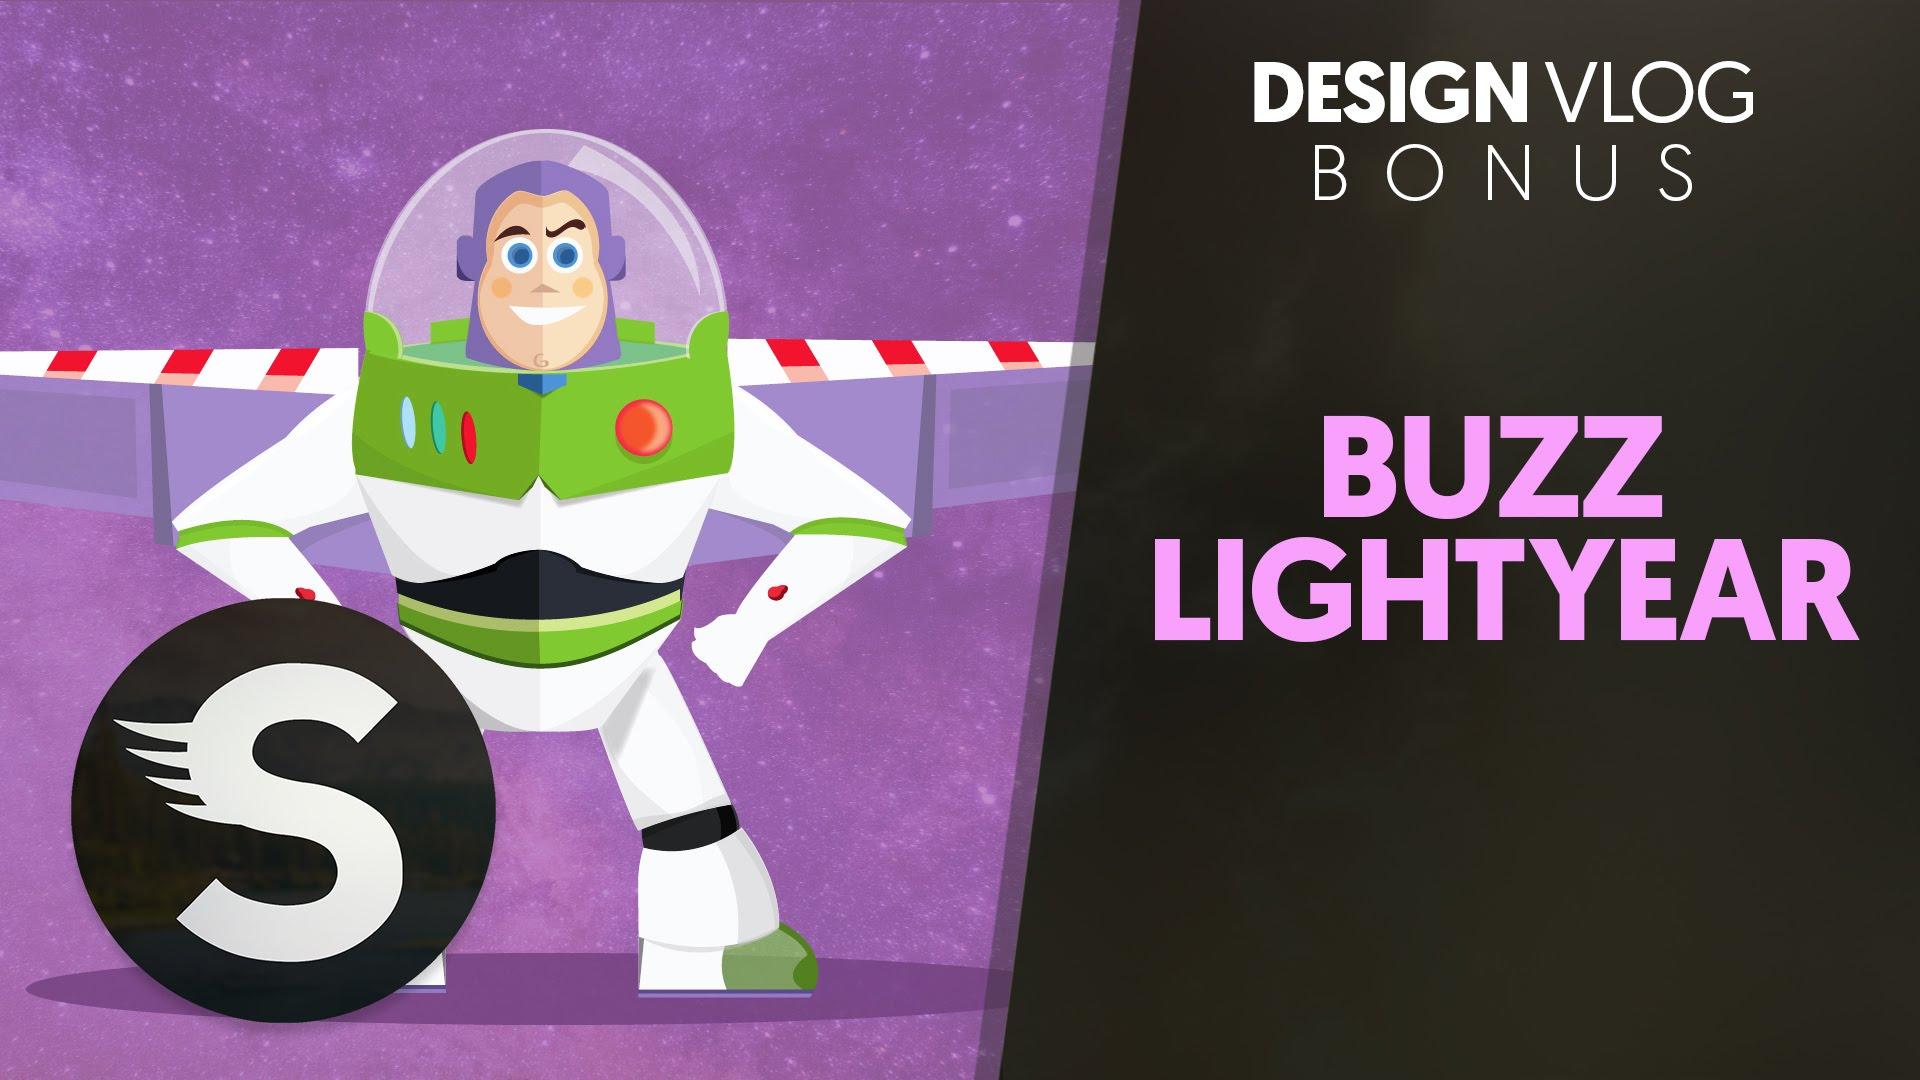 1920x1080 Design Vlog Buzz Lightyear Vector (Bonus)